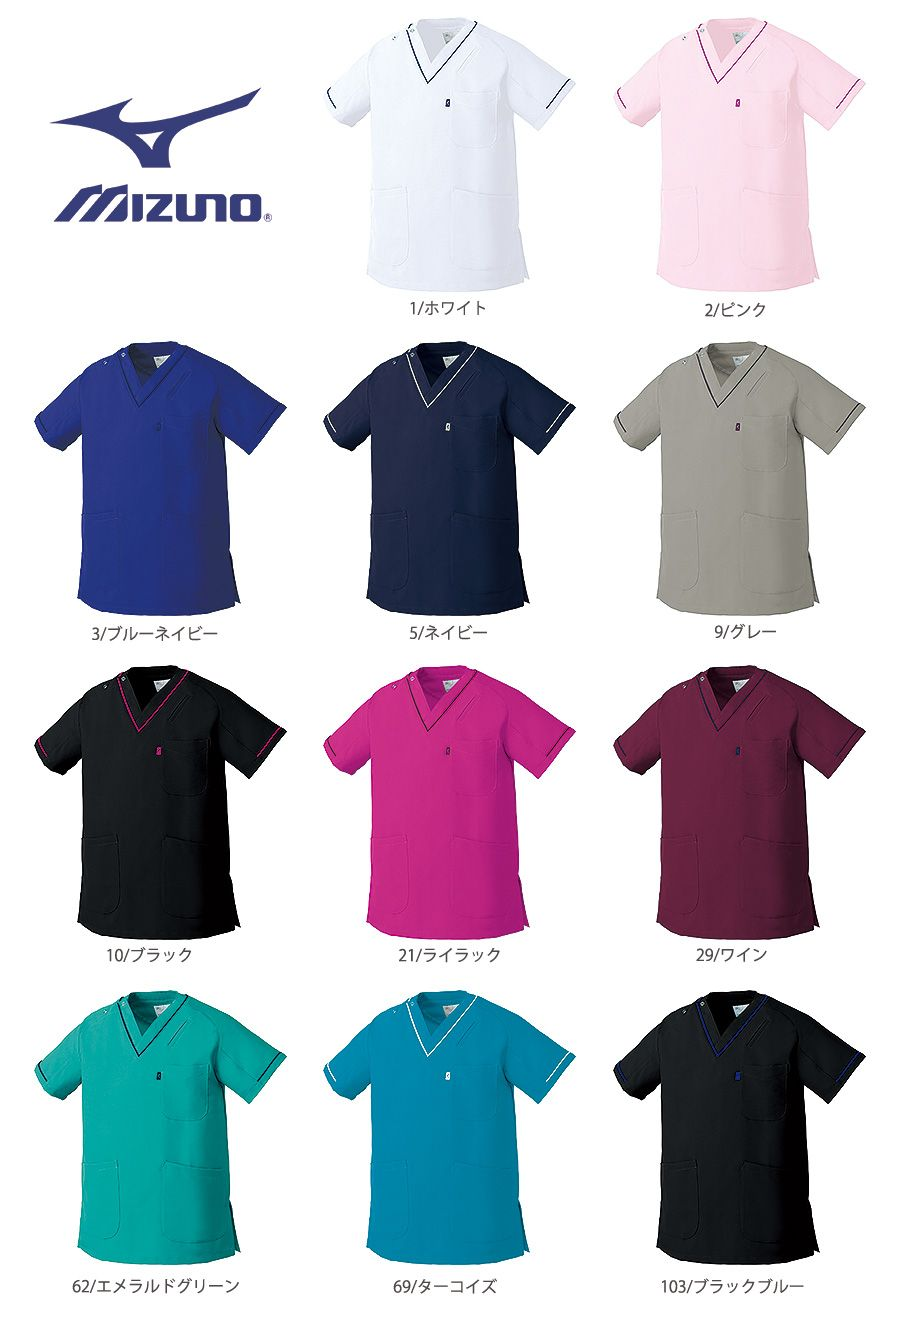 【Mizuno】ミズノ ストレッチスクラブ 白衣【WEB限定特価】